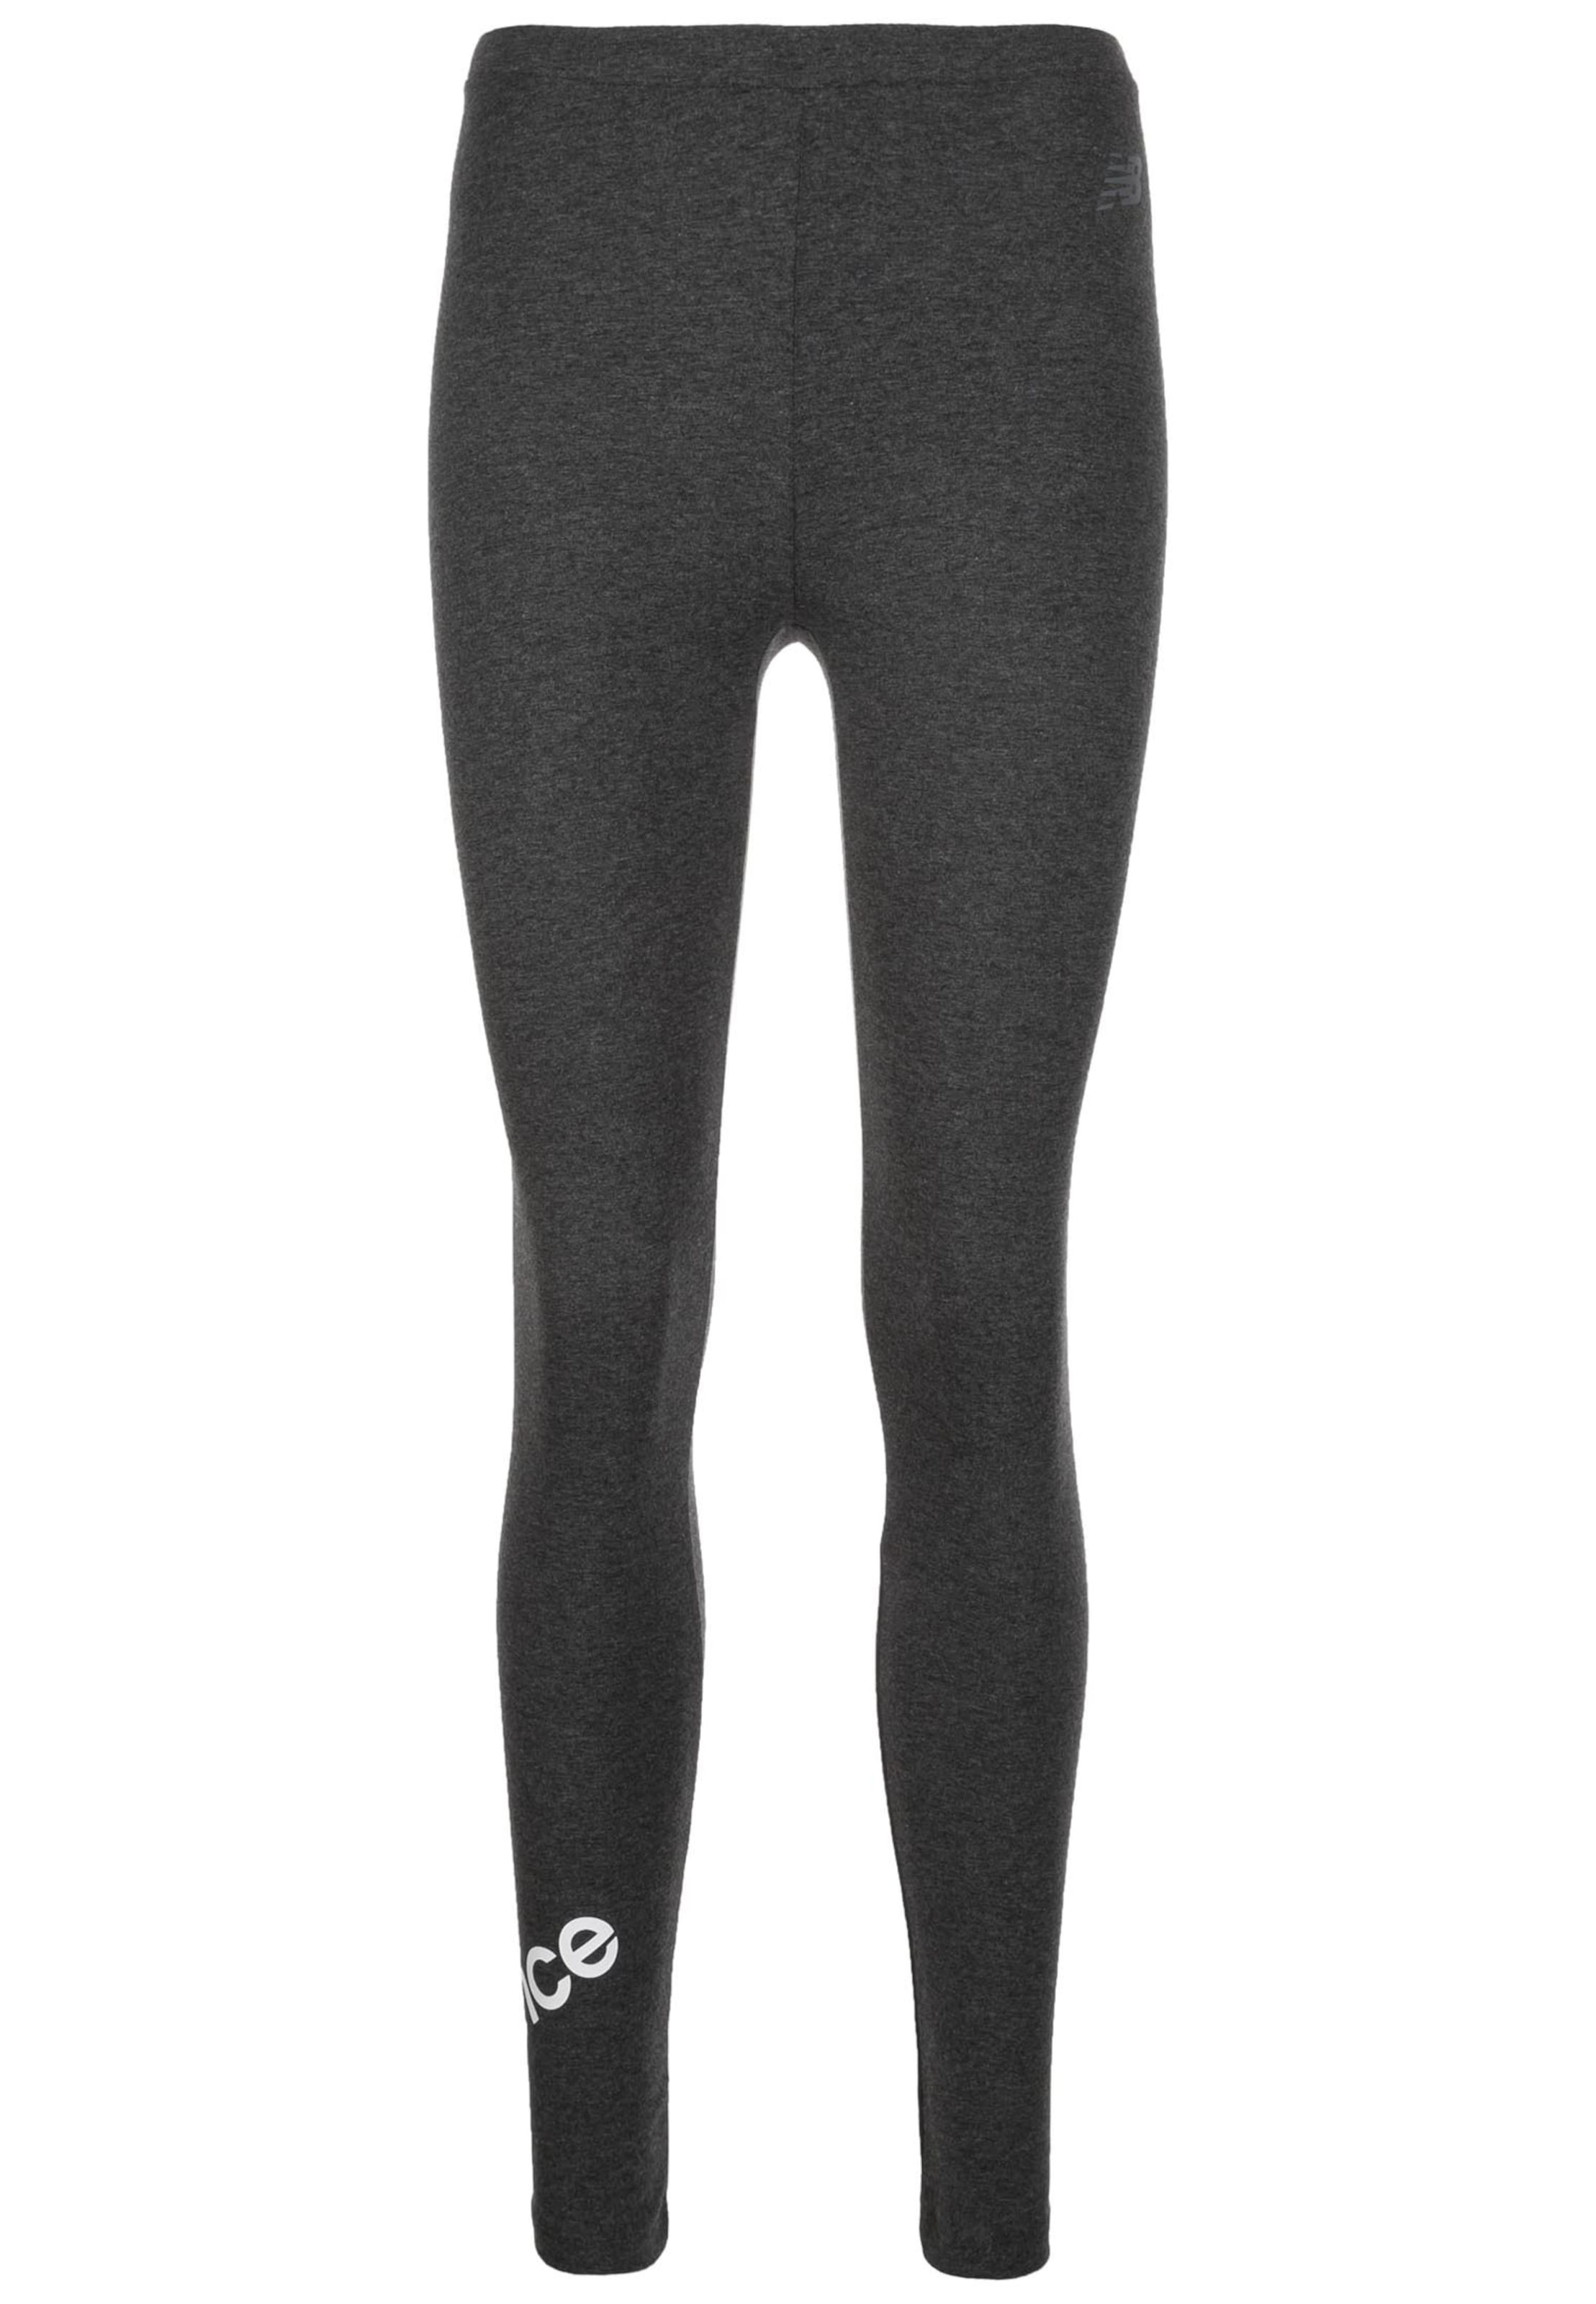 New Leggings En Balance Gris 'essentials' Foncé TucK1lJF3